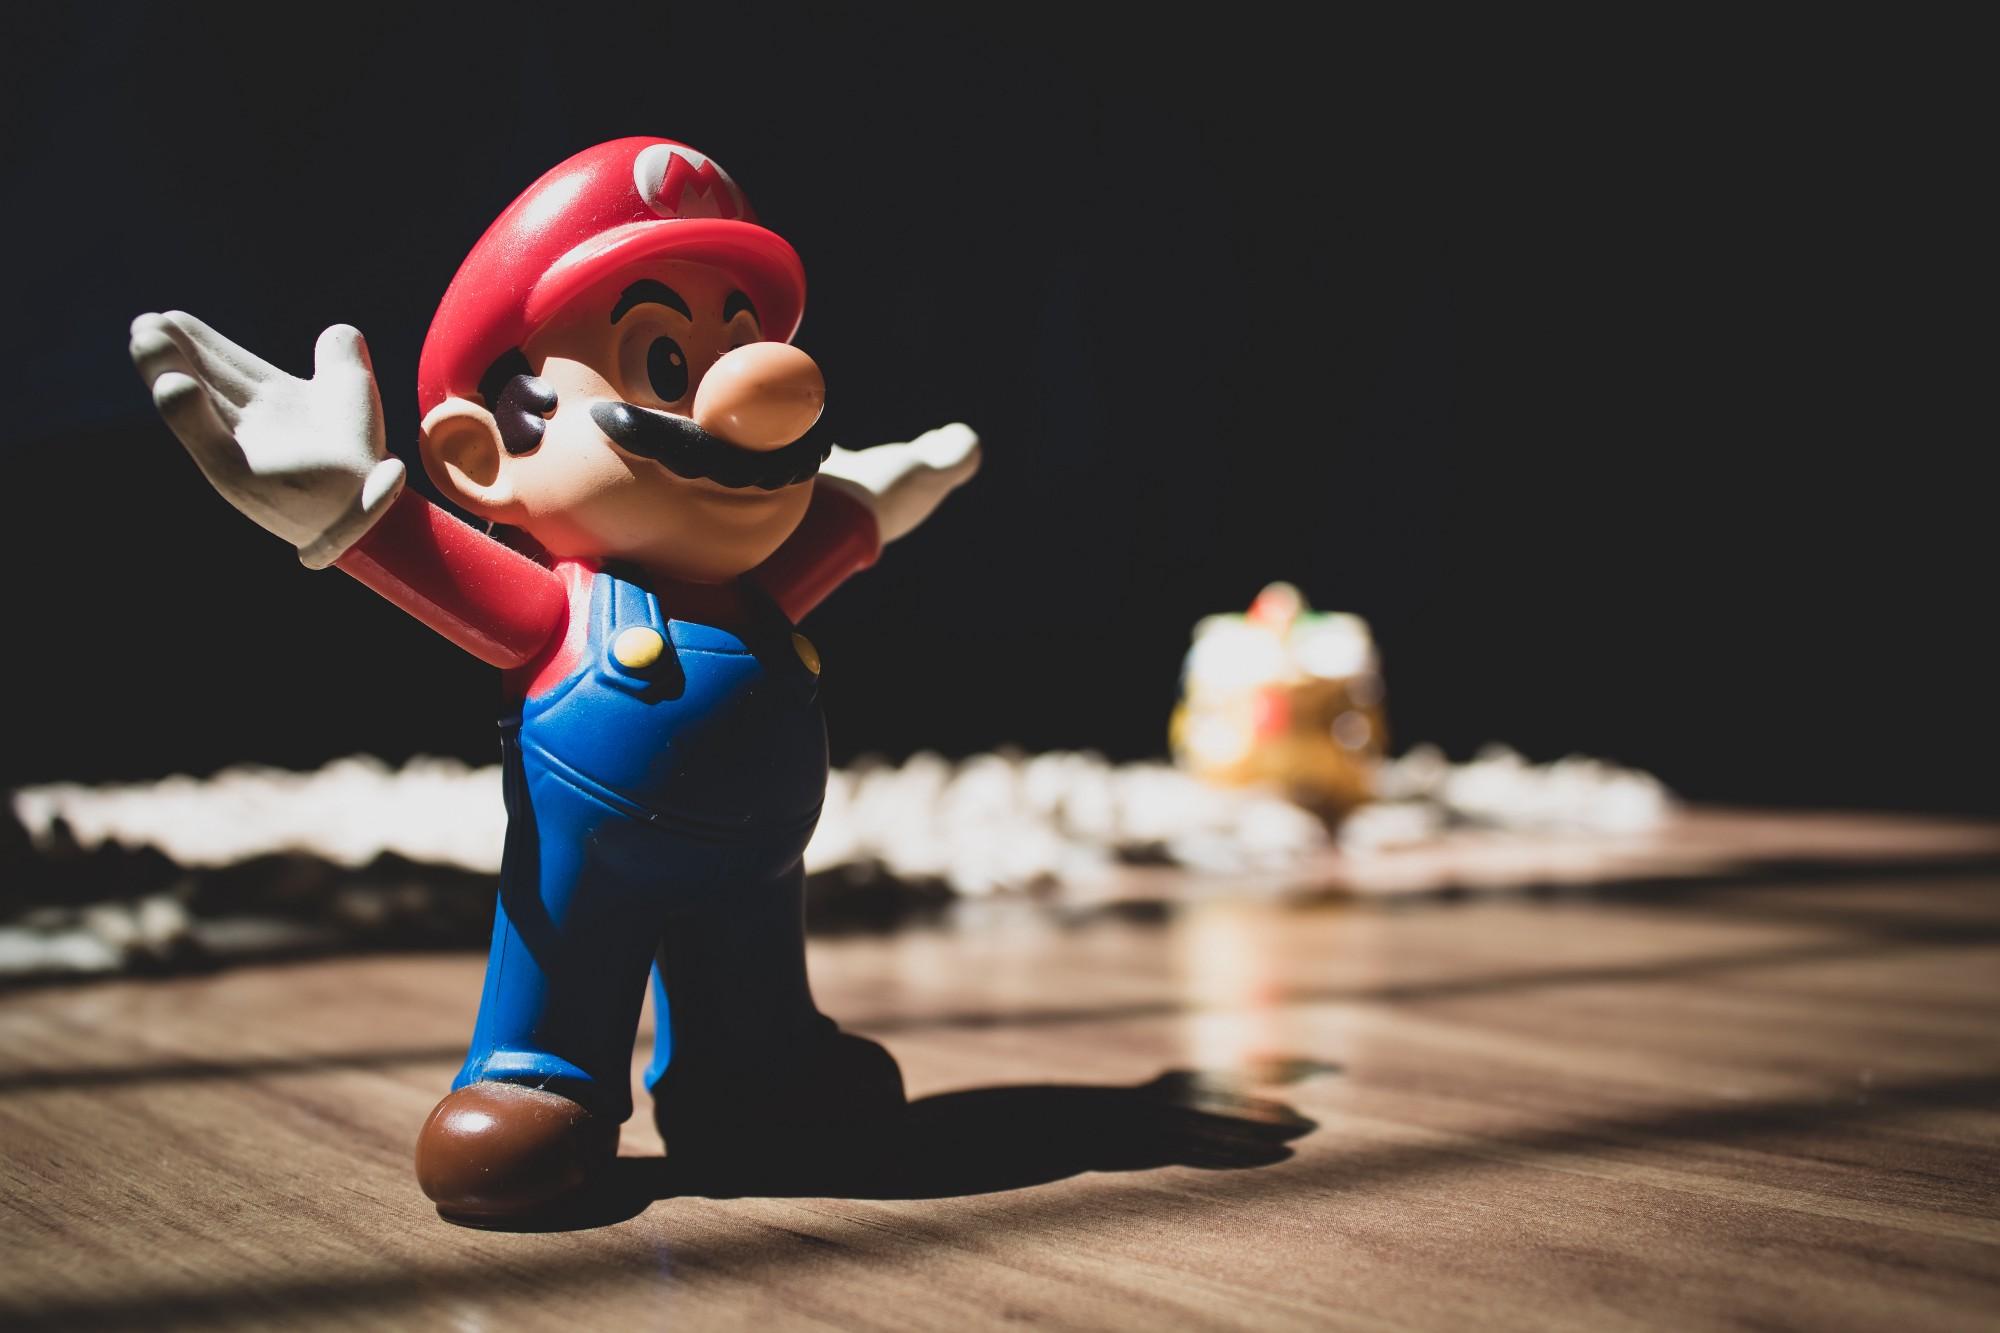 Jogar Super Mario traz benefícios ao cérebro